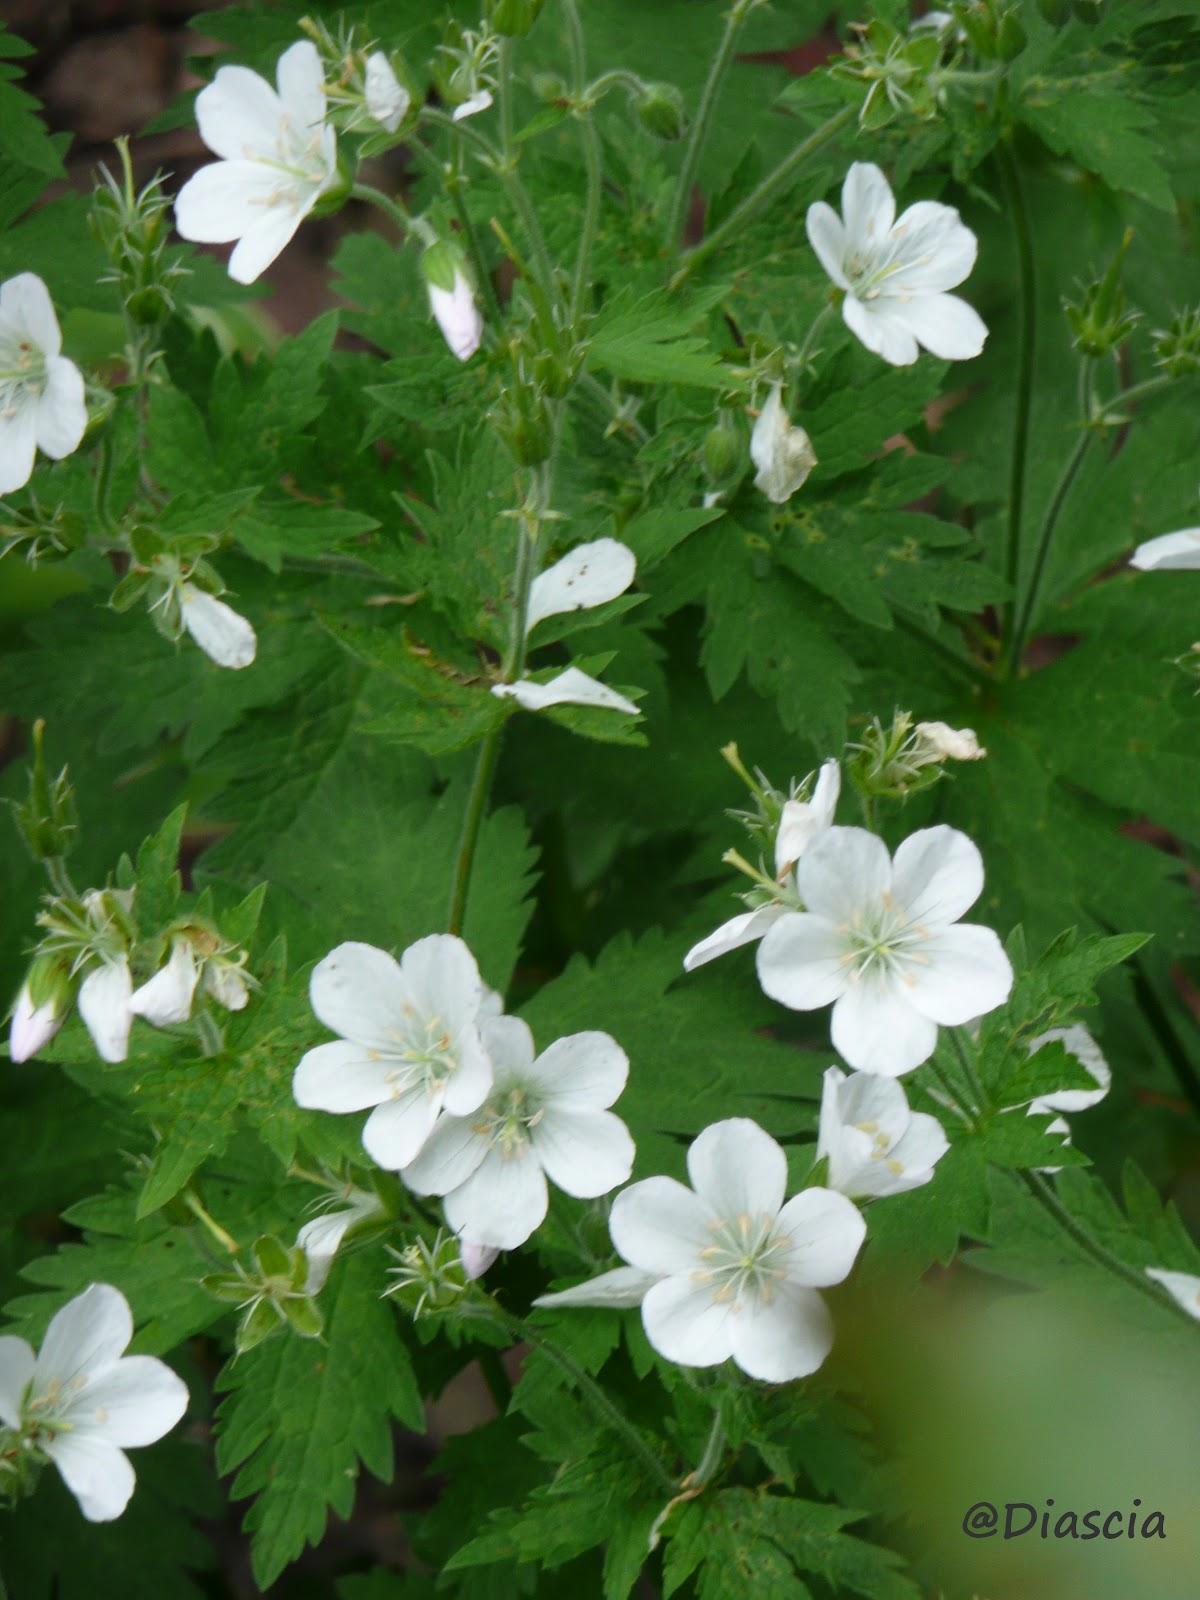 Le jardin de diascia geranium sylvaticum for Jardin de fleurs blanches